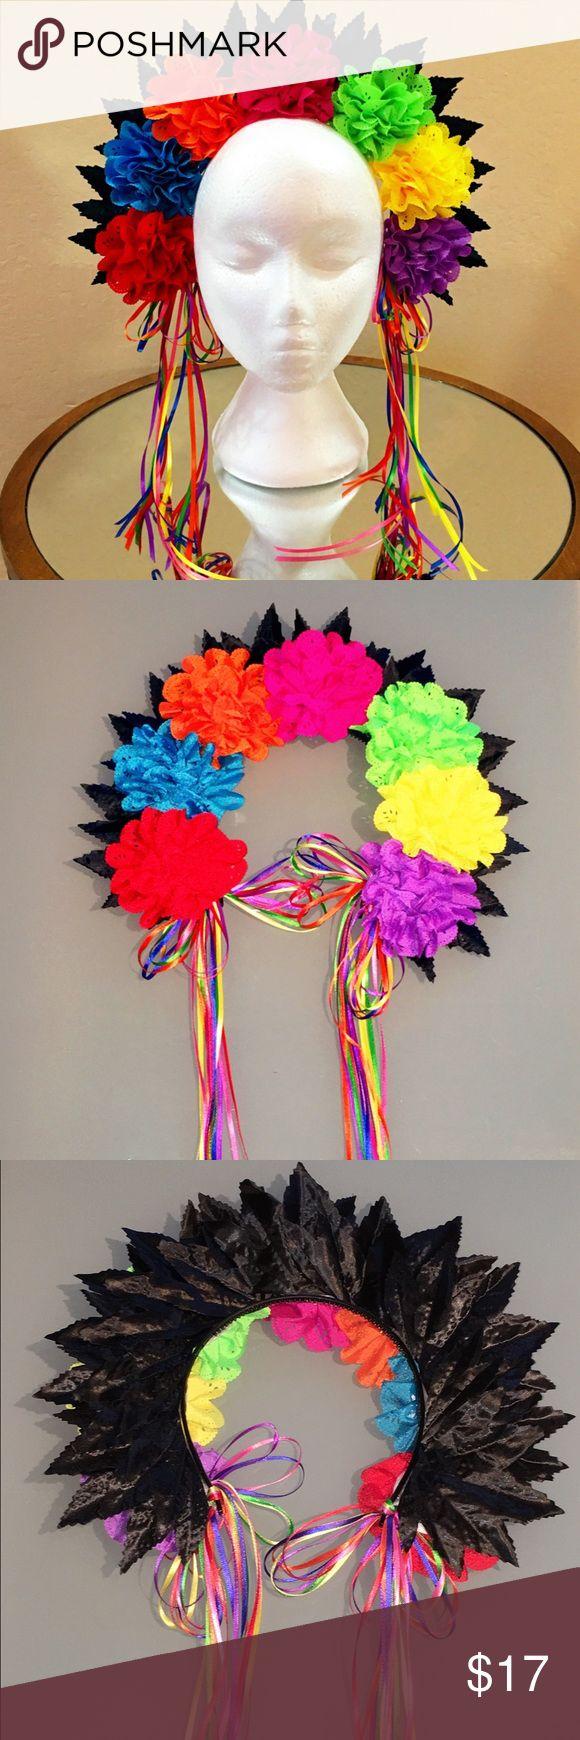 Lace Floral Crown / Headband Handmade , bright & beautiful Lace Floral Crown /Headband great for upcoming festivals, birthdays, weddings etc.... Accessories Hair Accessories